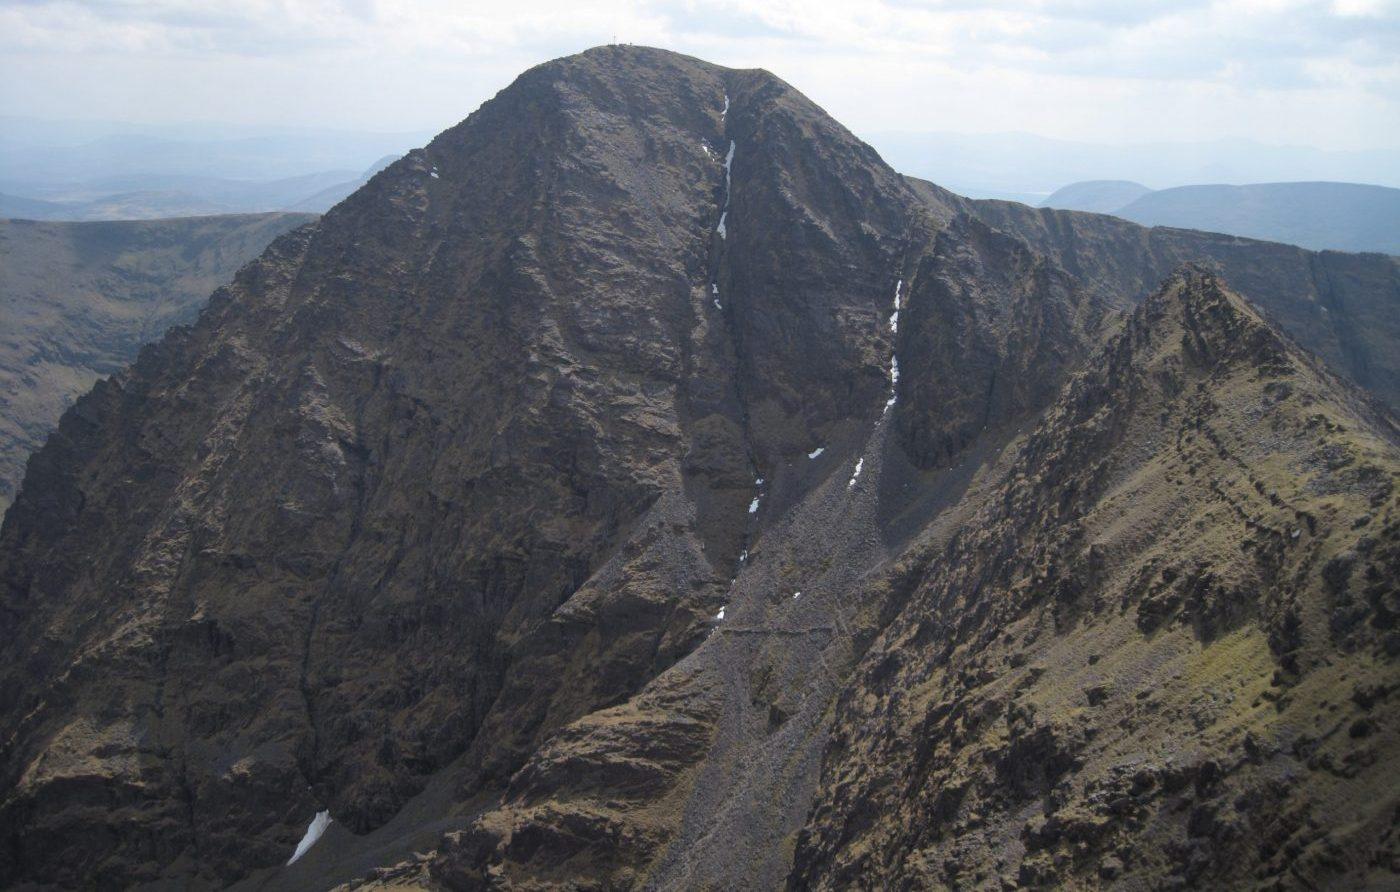 Killarney Mountaineering Club